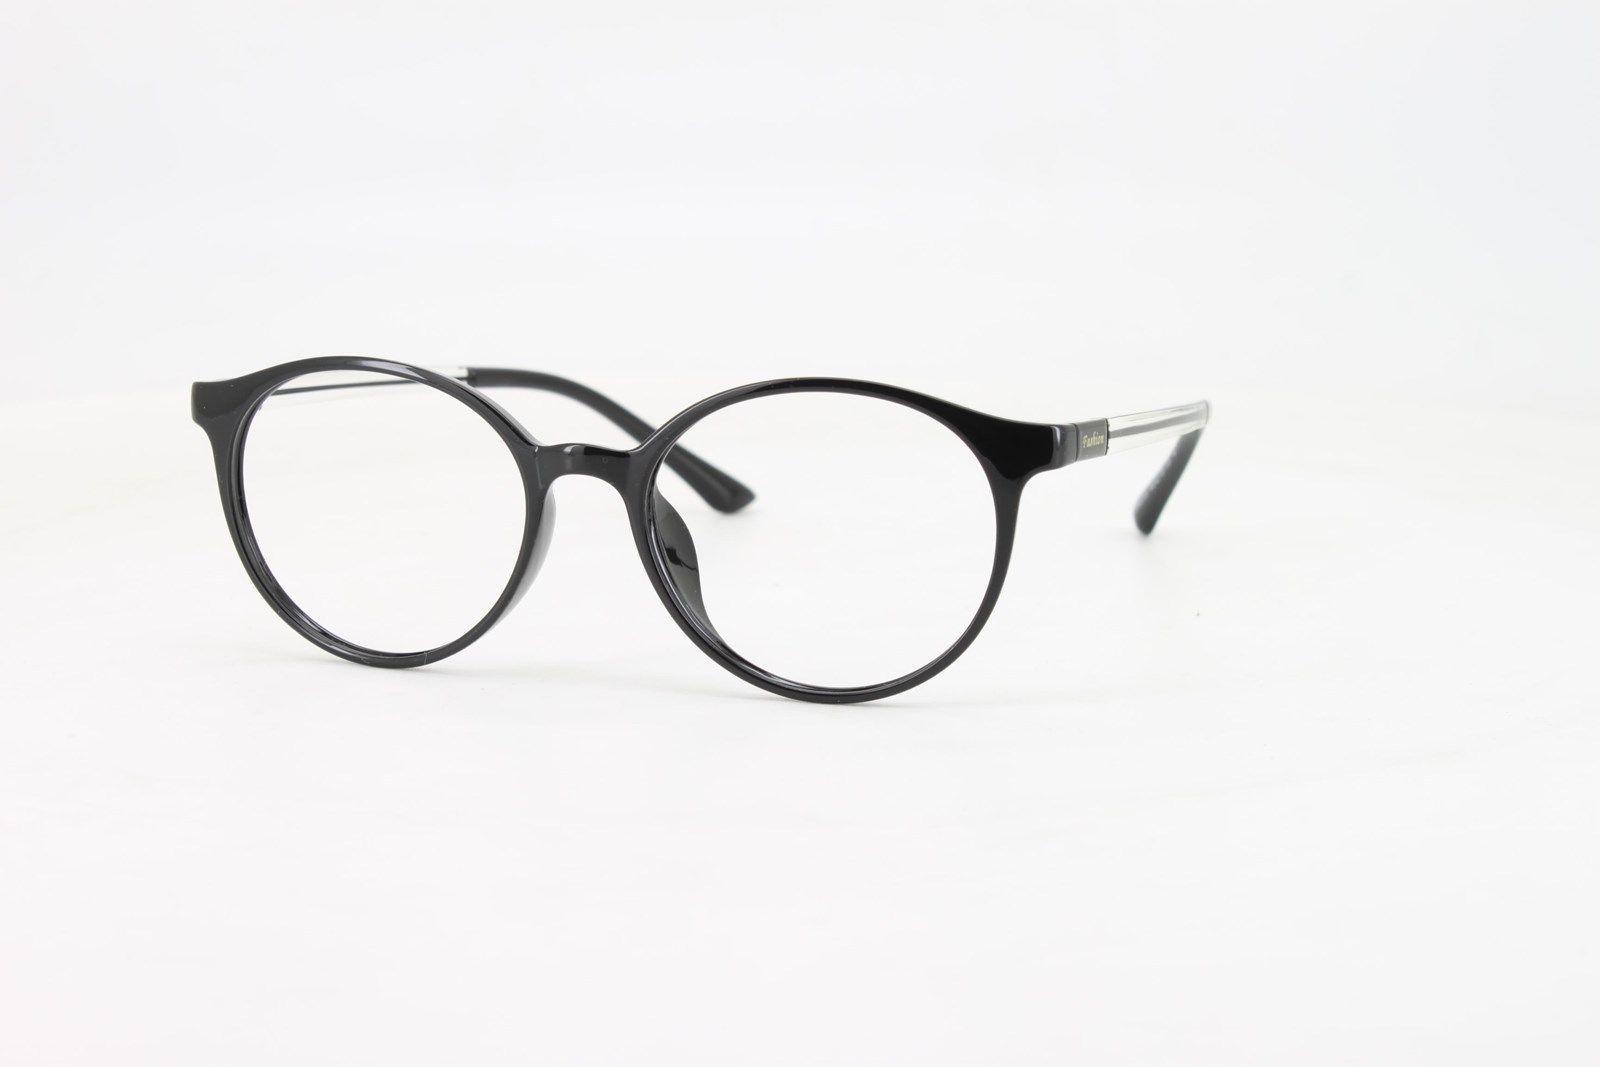 f0d80e6221 Ebe Bifocal Reading Glasses Mens Womens and 50 similar items. S l1600